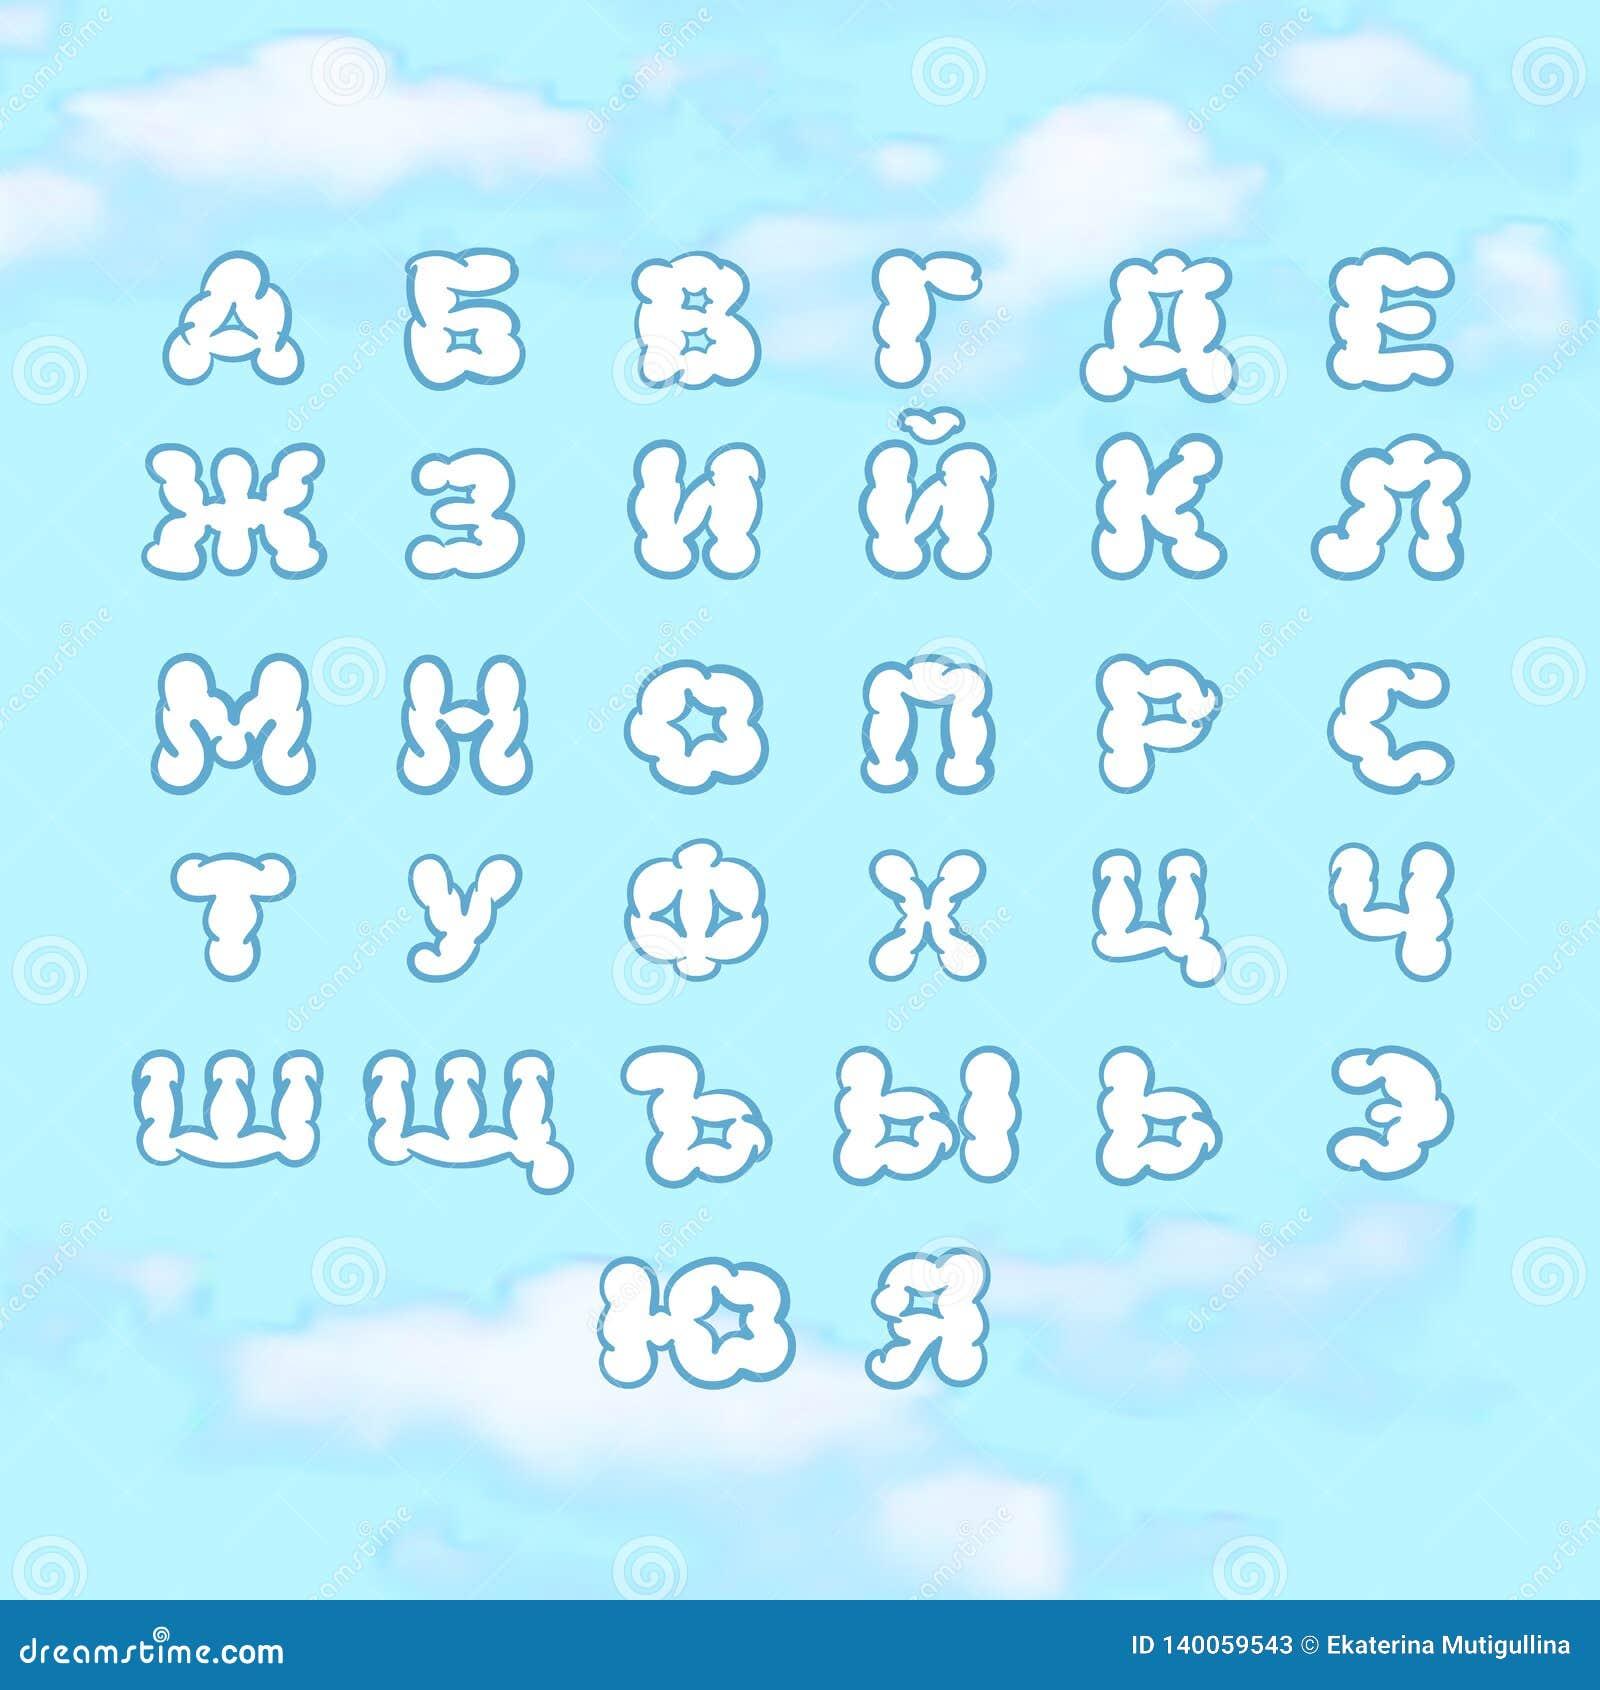 Alphabet cyrillique de nuages